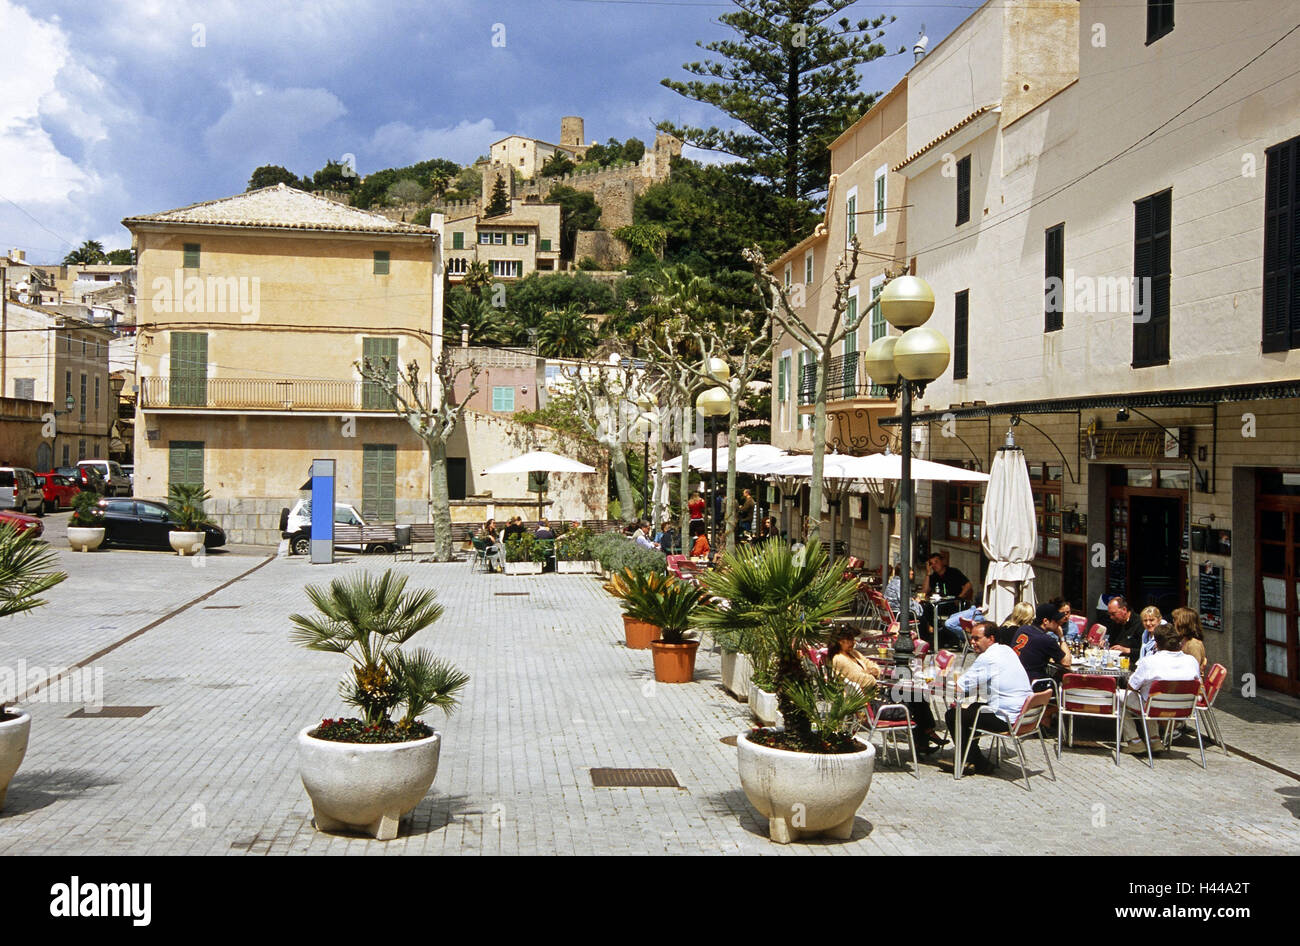 Spain, the Balearic Islands, island Majorca, Capdepera, Place de ...